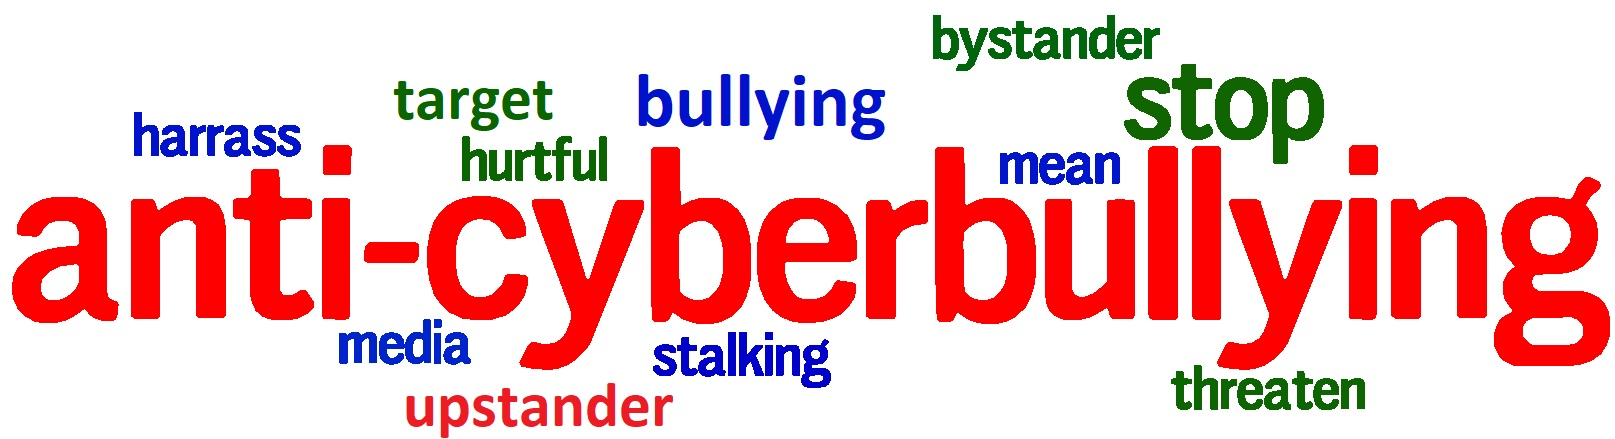 anti-cyberbullying